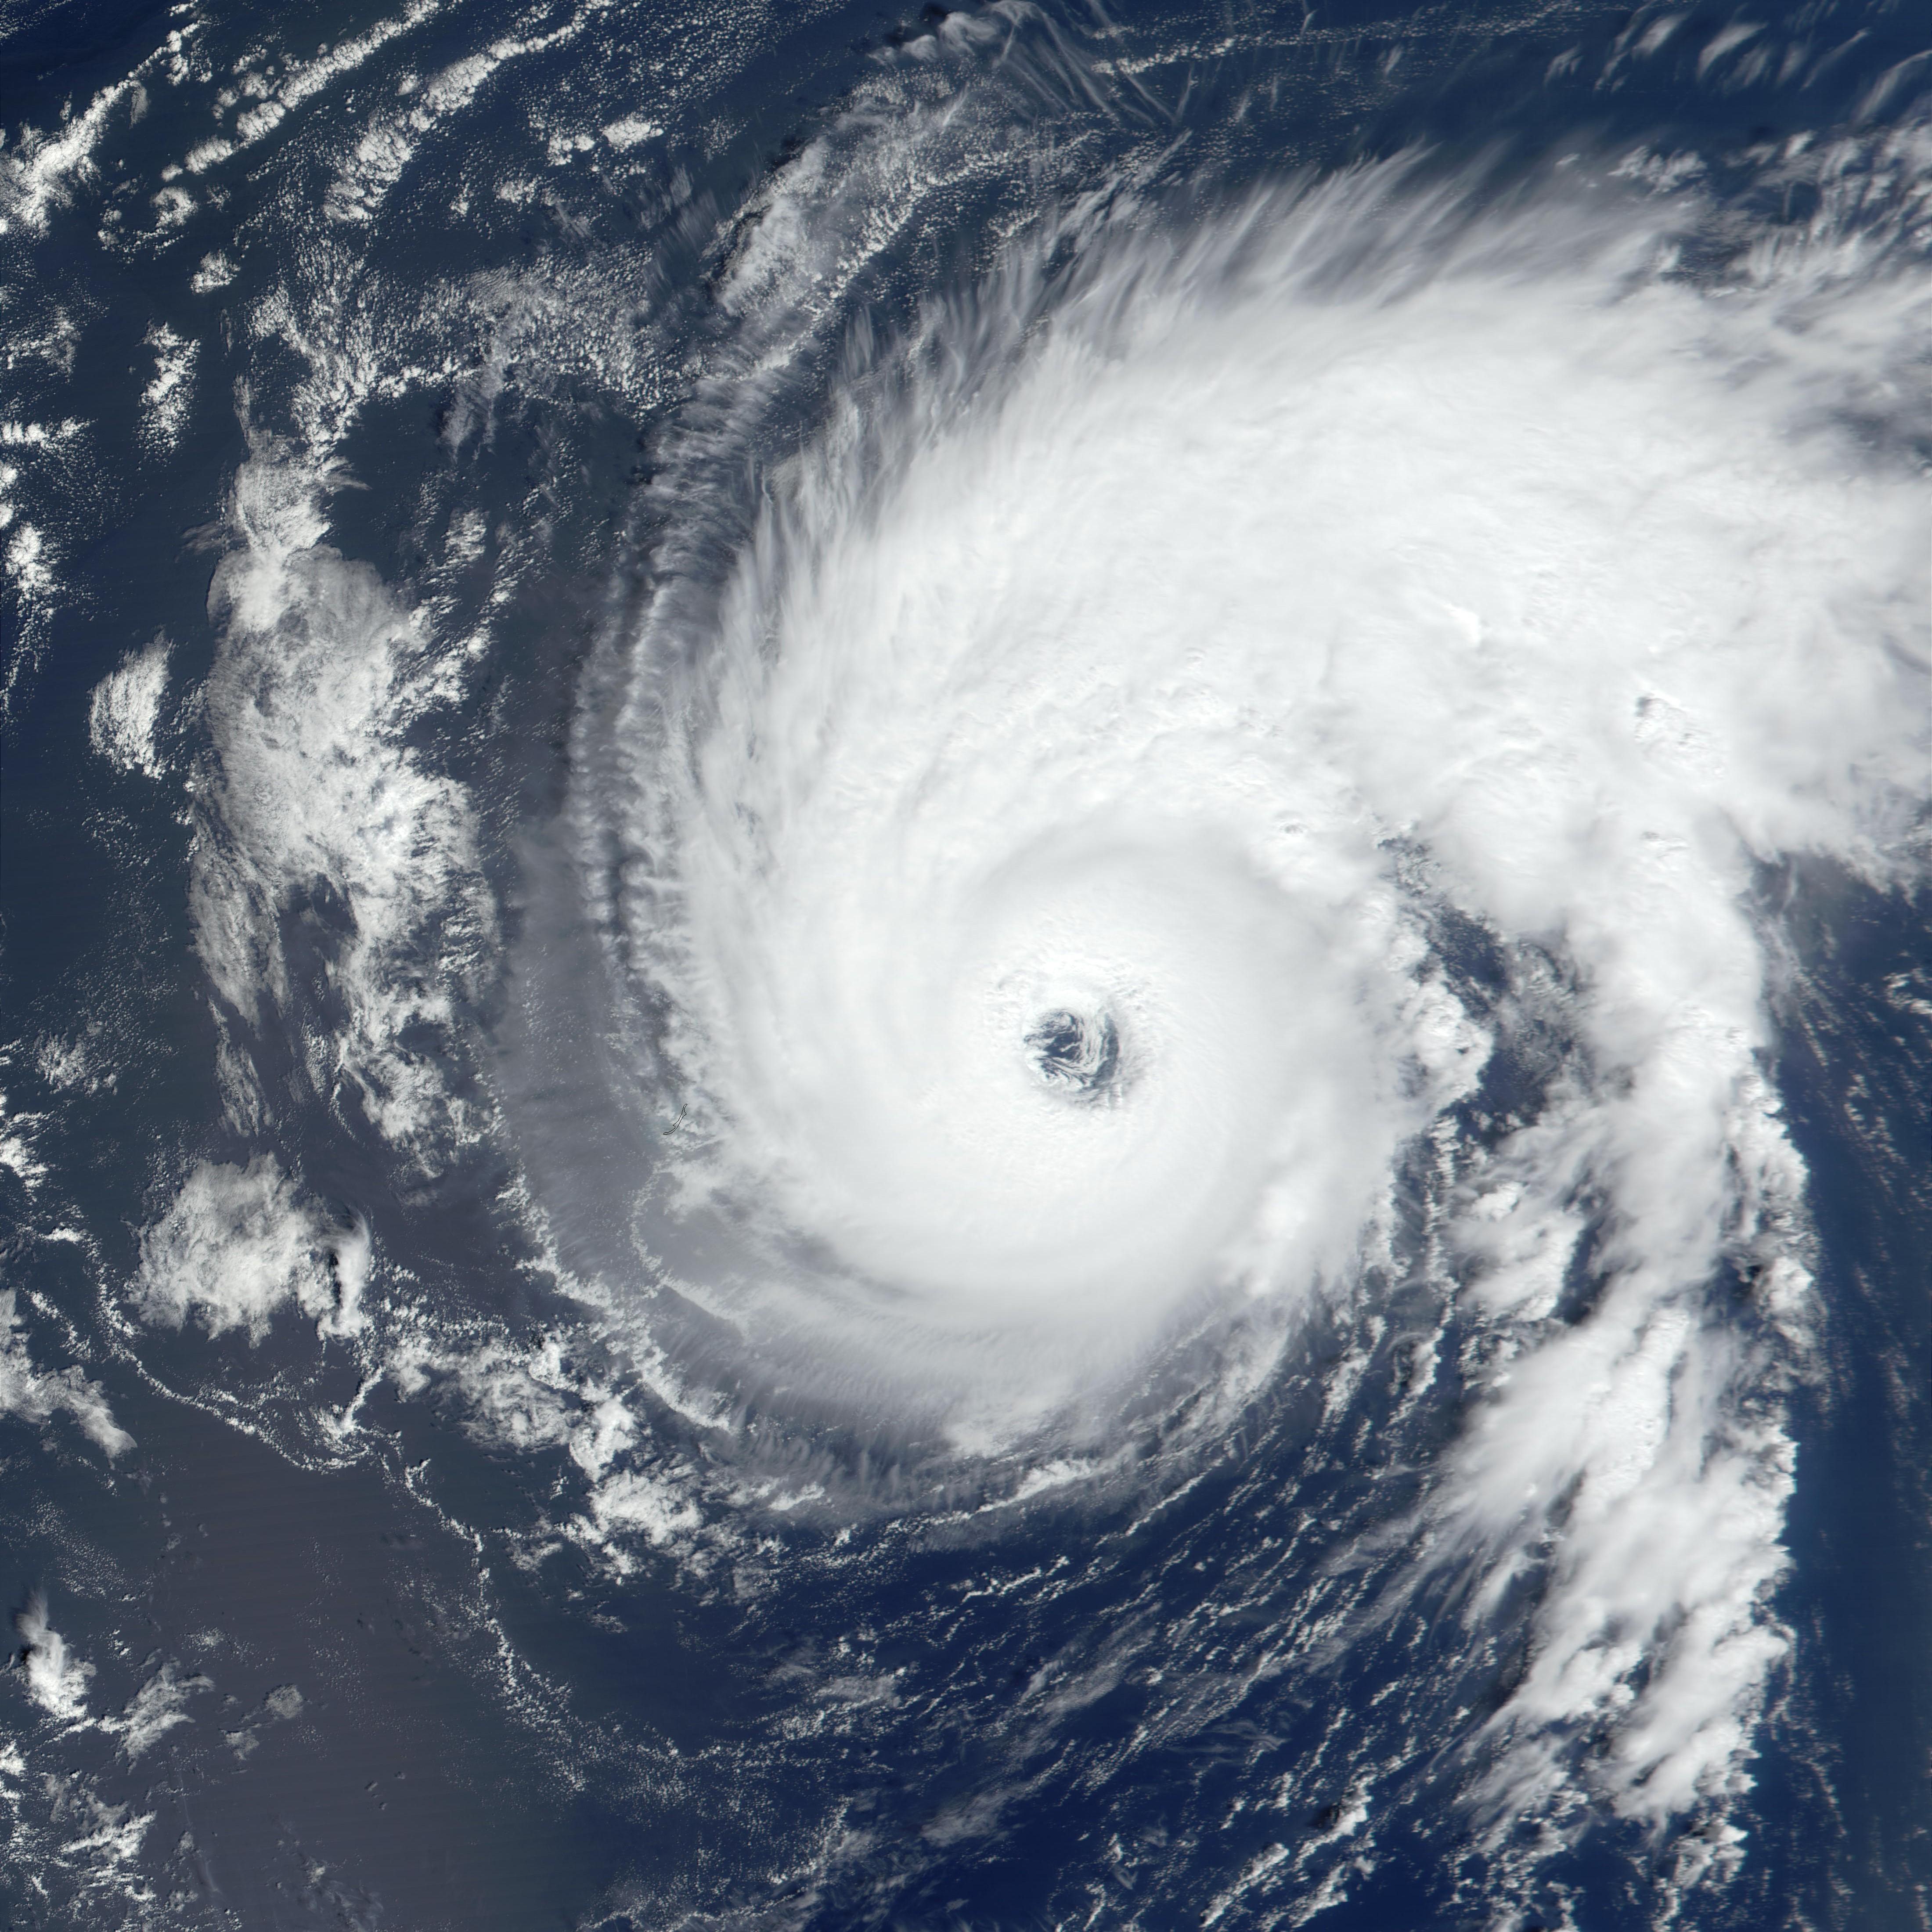 Natural Disasters Hurricanes Wikipedia